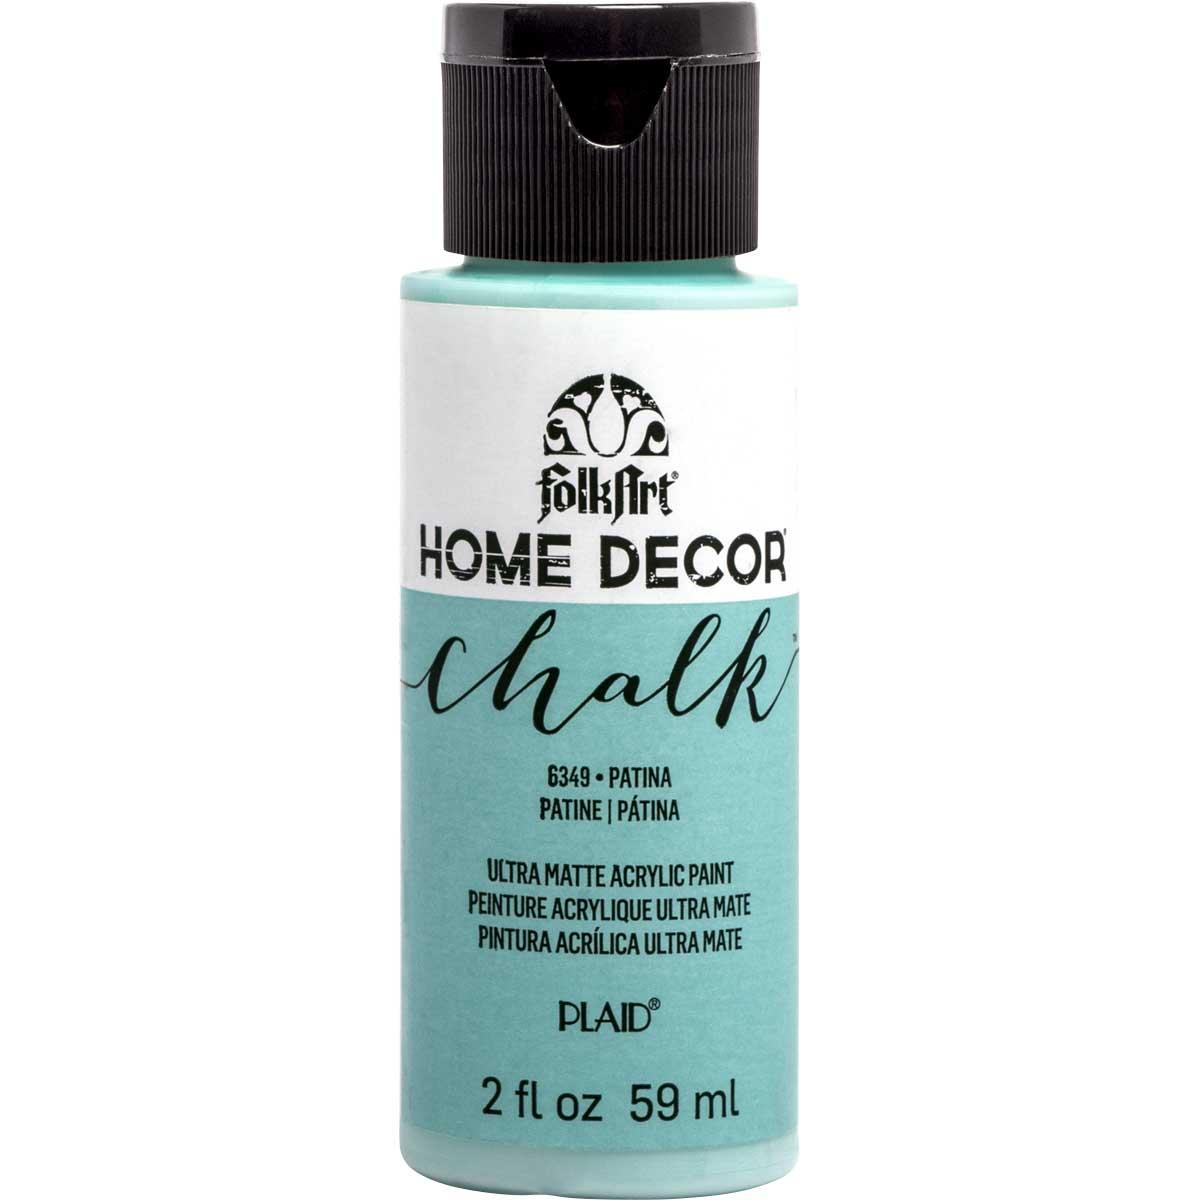 FolkArt ® Home Decor™ Chalk - Patina, 2 oz. - 6349